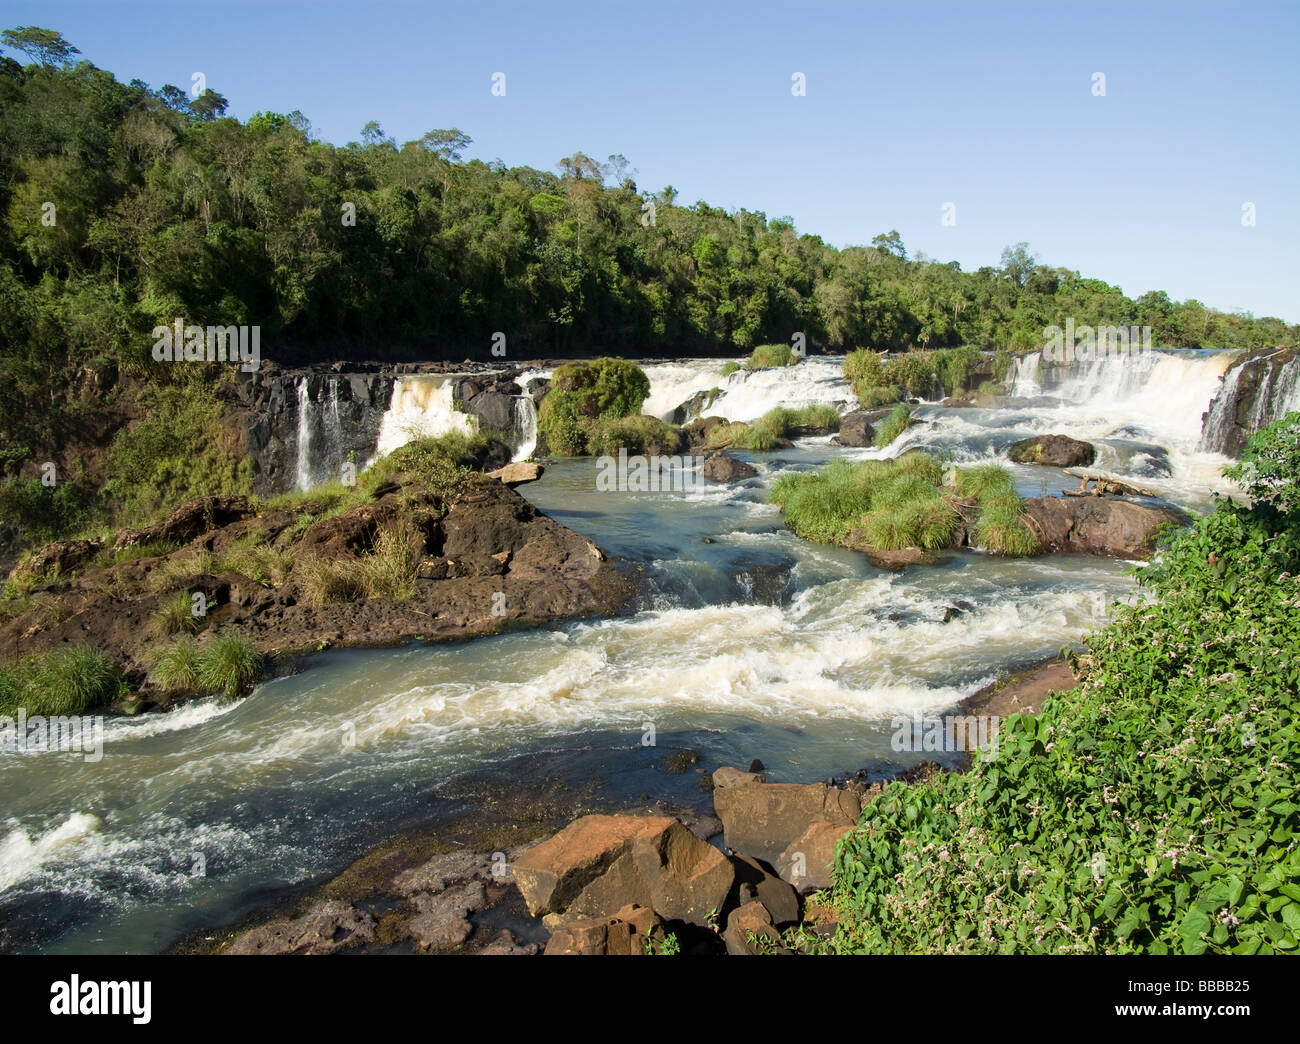 Paraguay.Department Alto paraná.Waterfalls of Monday River. - Stock Image